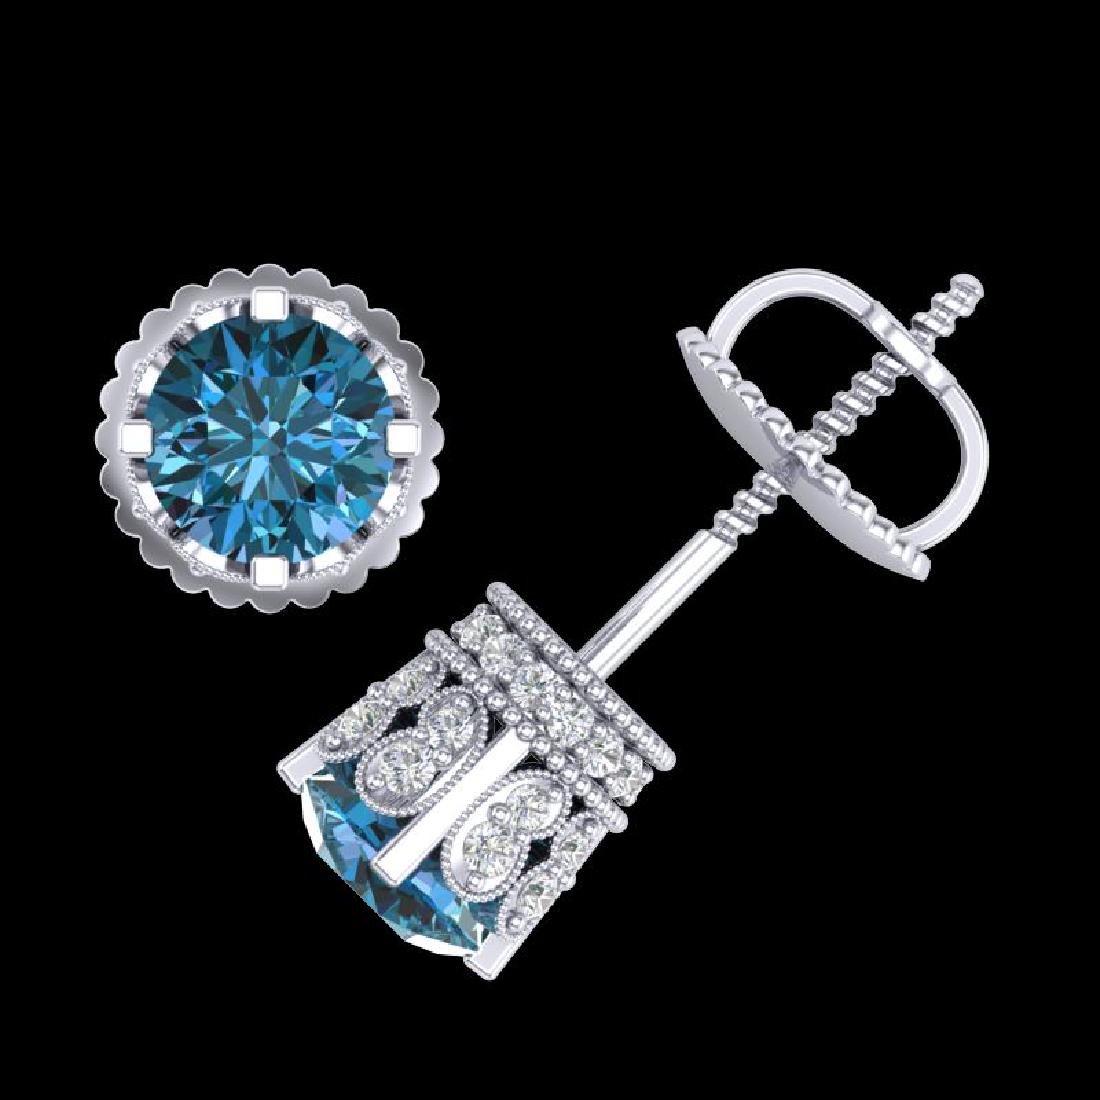 1.75 CTW Fancy Intense Blue Diamond Art Deco Stud - 3